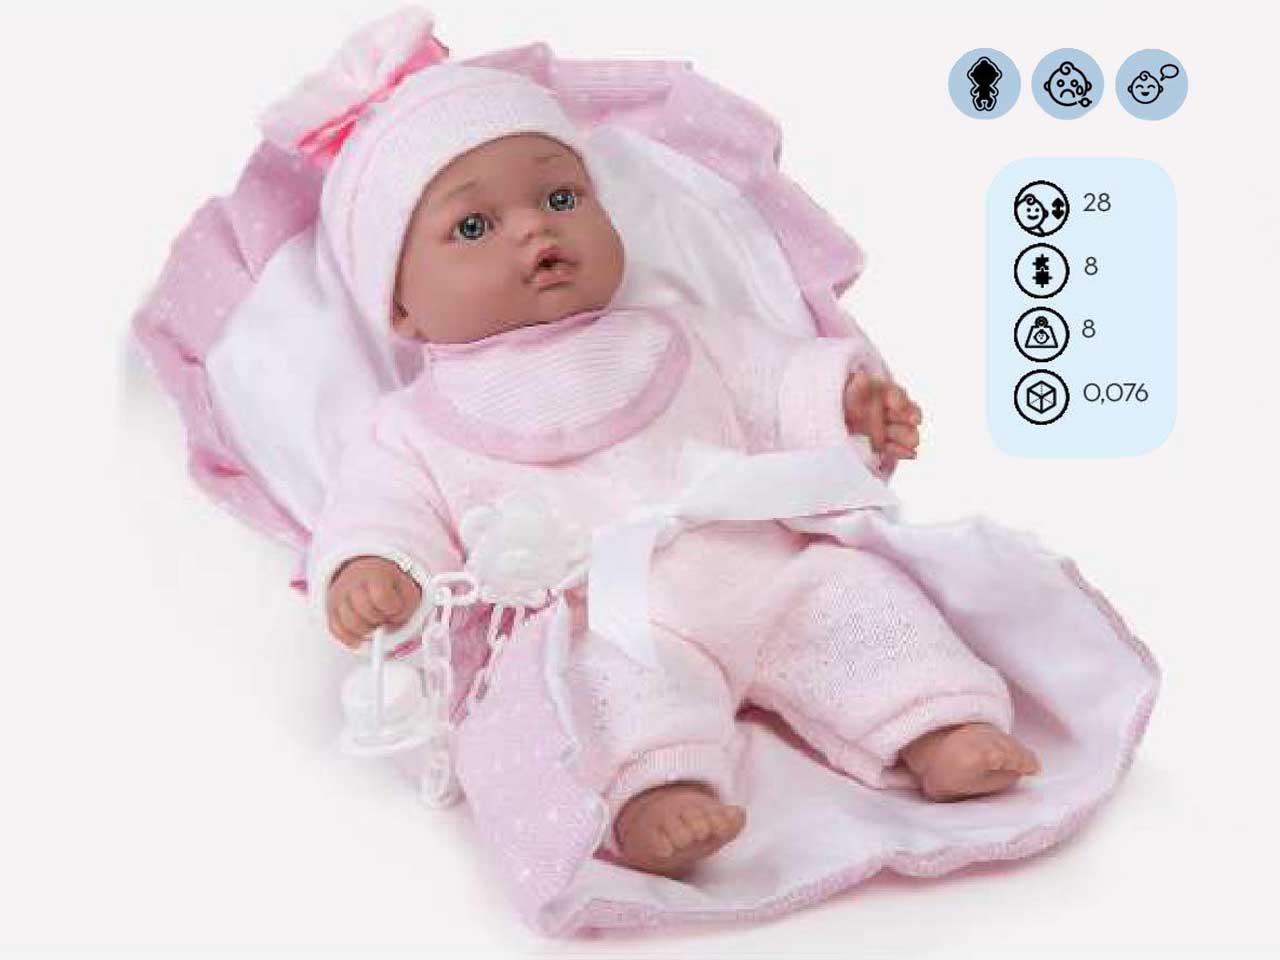 BAMBOLA MORBIDA CON PORT ENFANT ROSA 28 CM CON VOCE SC.SINGOLA